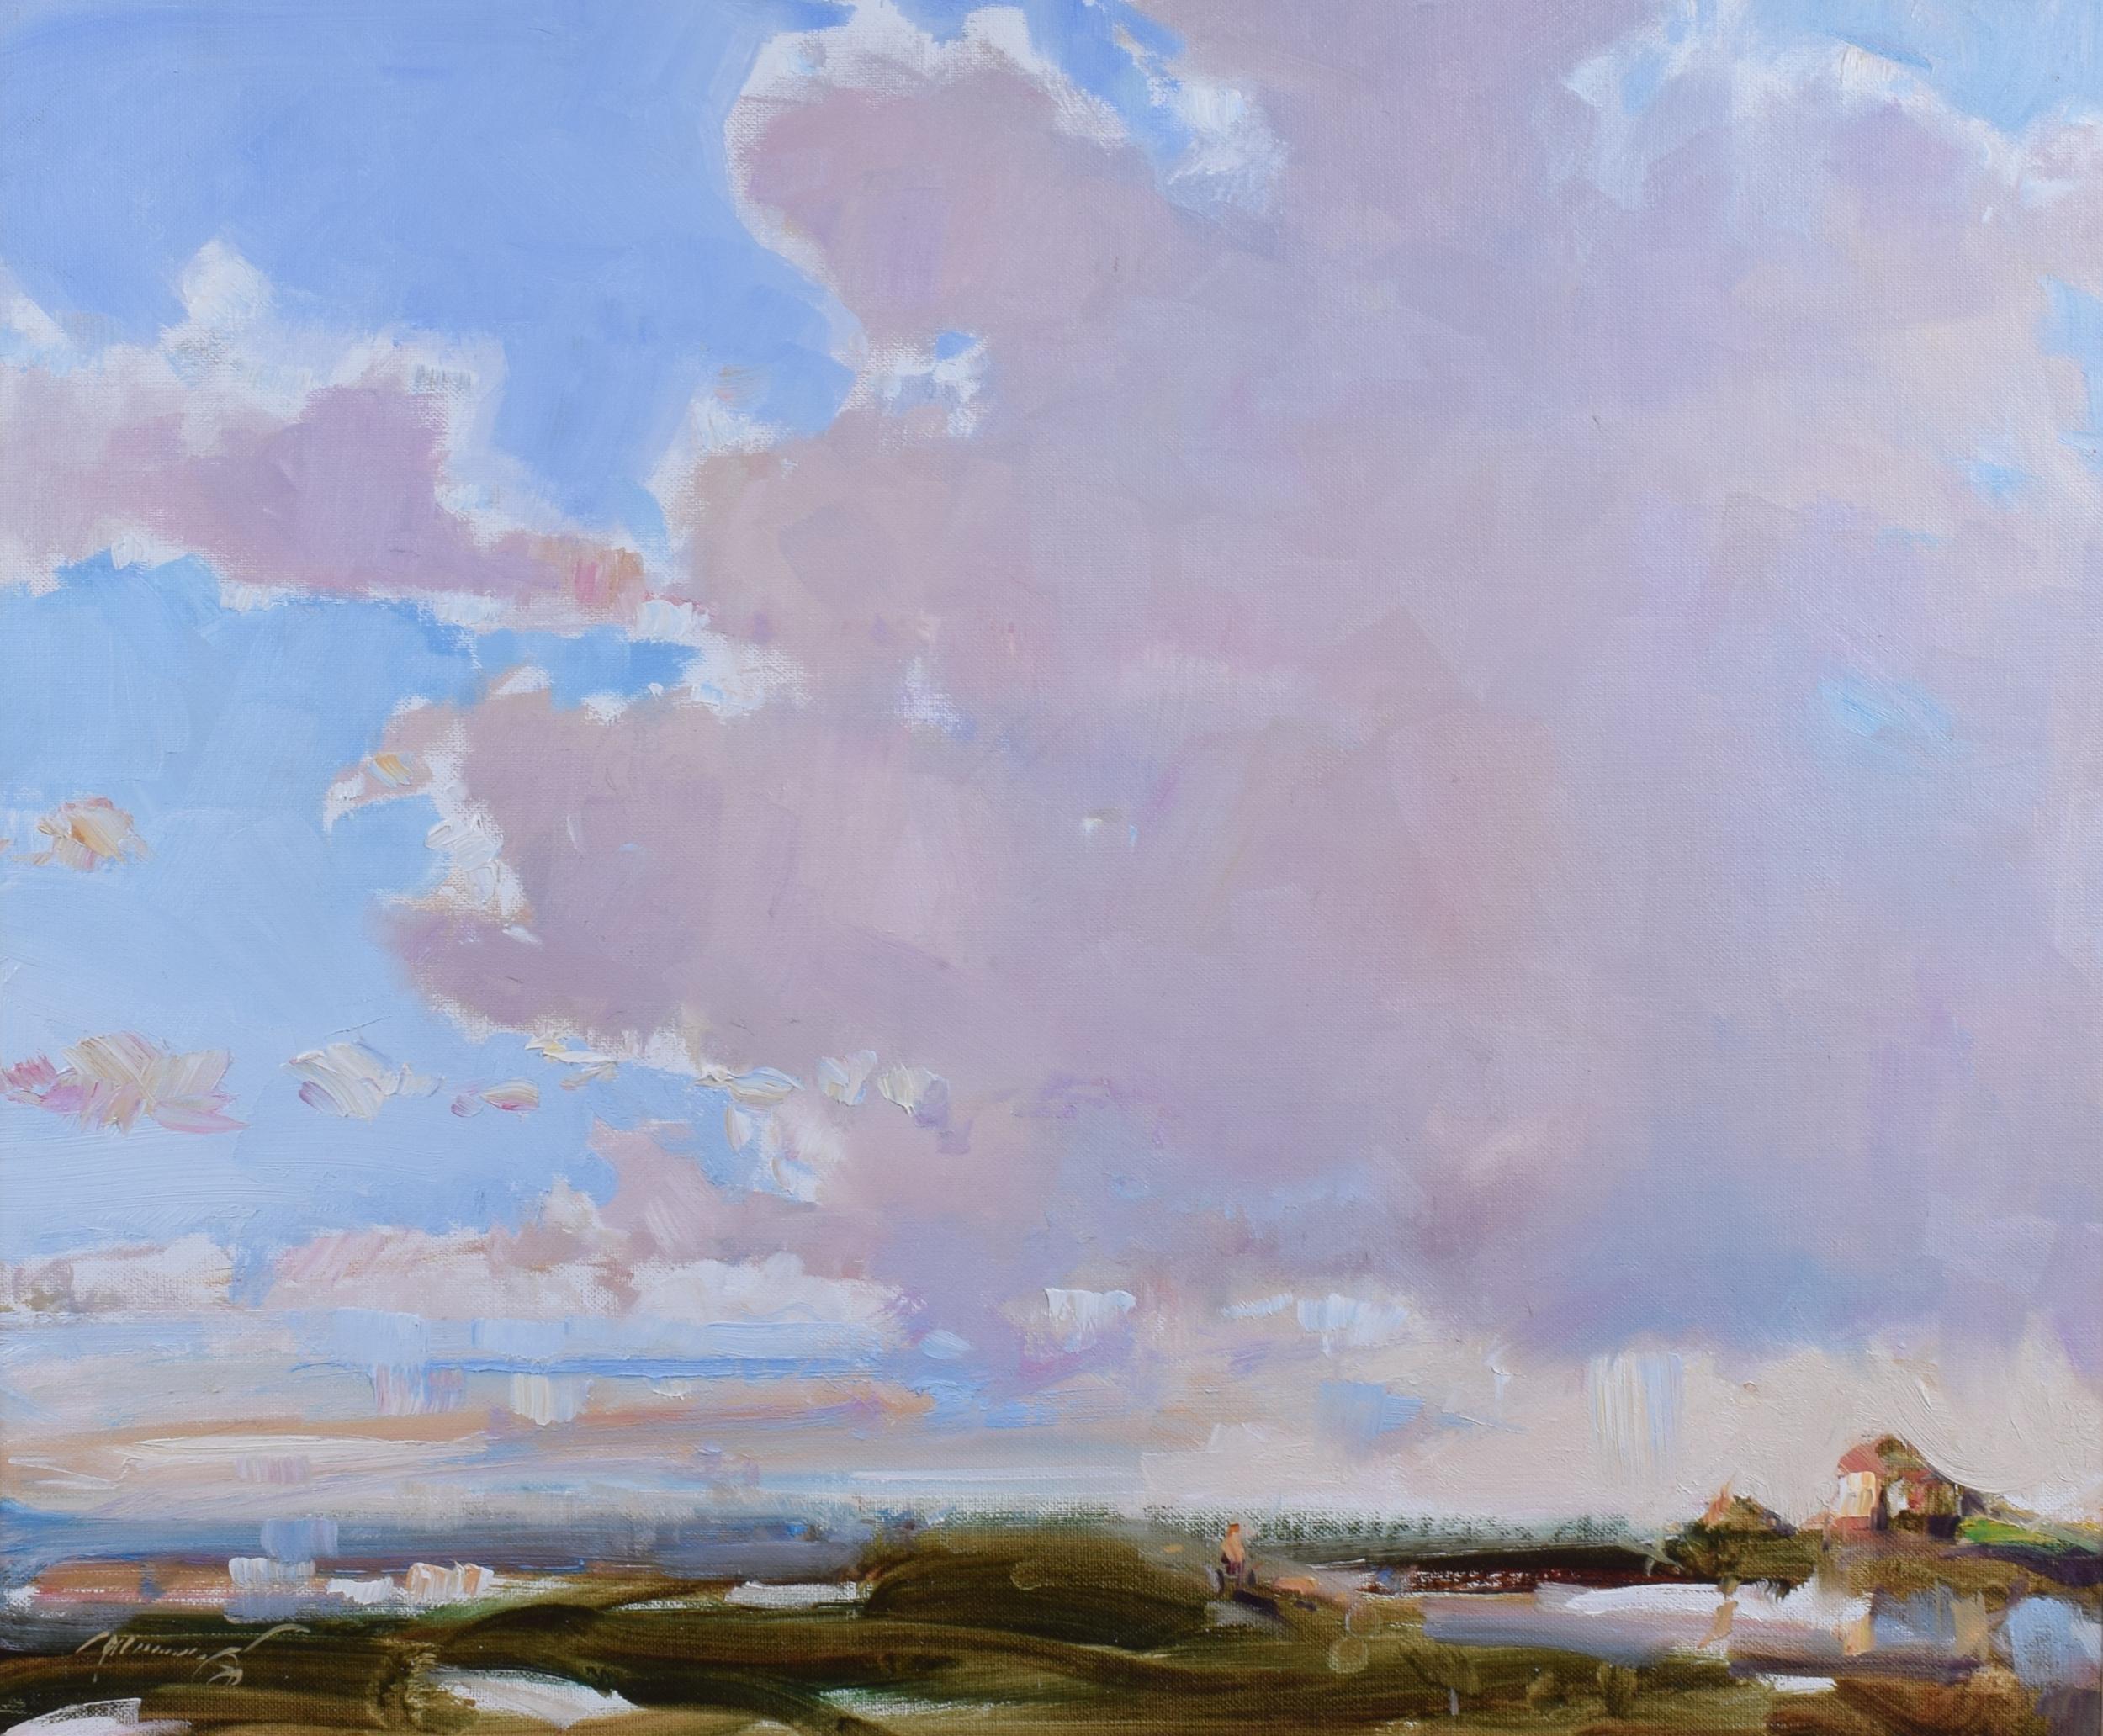 Ken Moroney The Fens Norfolk England Oil on Canvasboard painting art skies